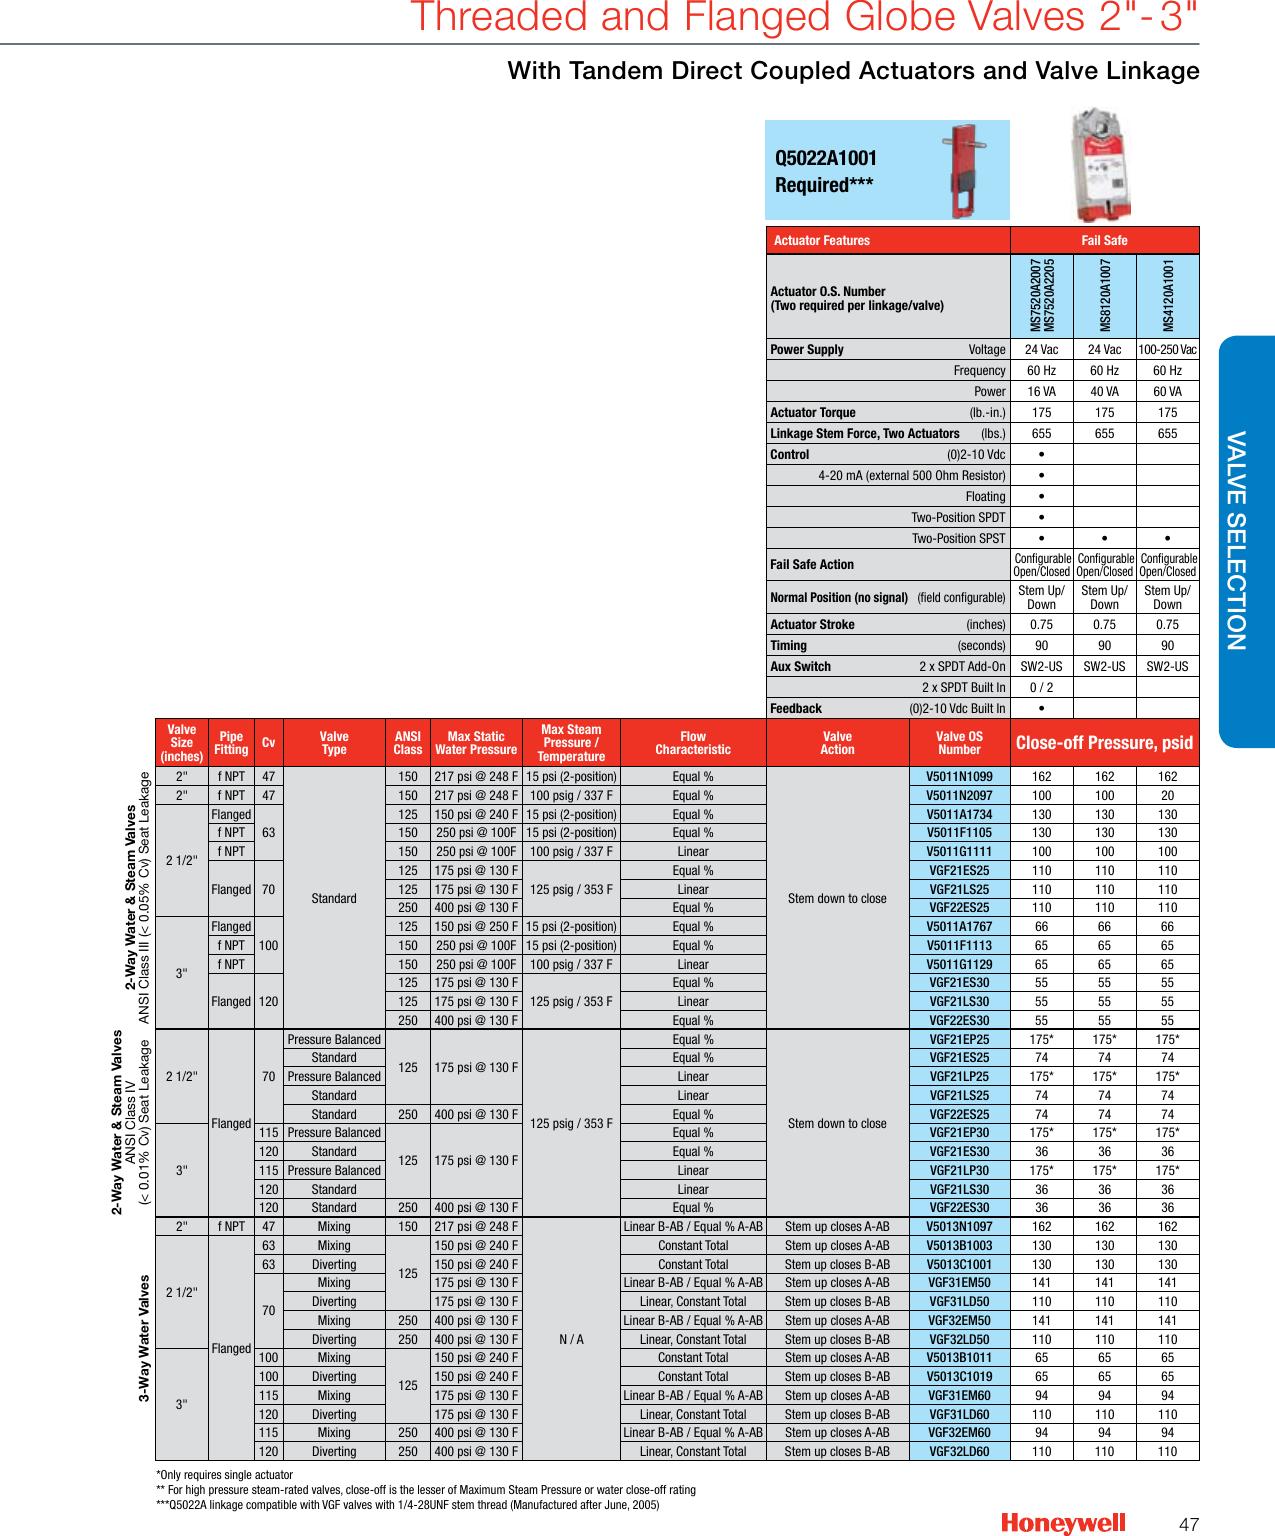 Invensys MA-230-0-2-1 HVAC 2-Position Actuator